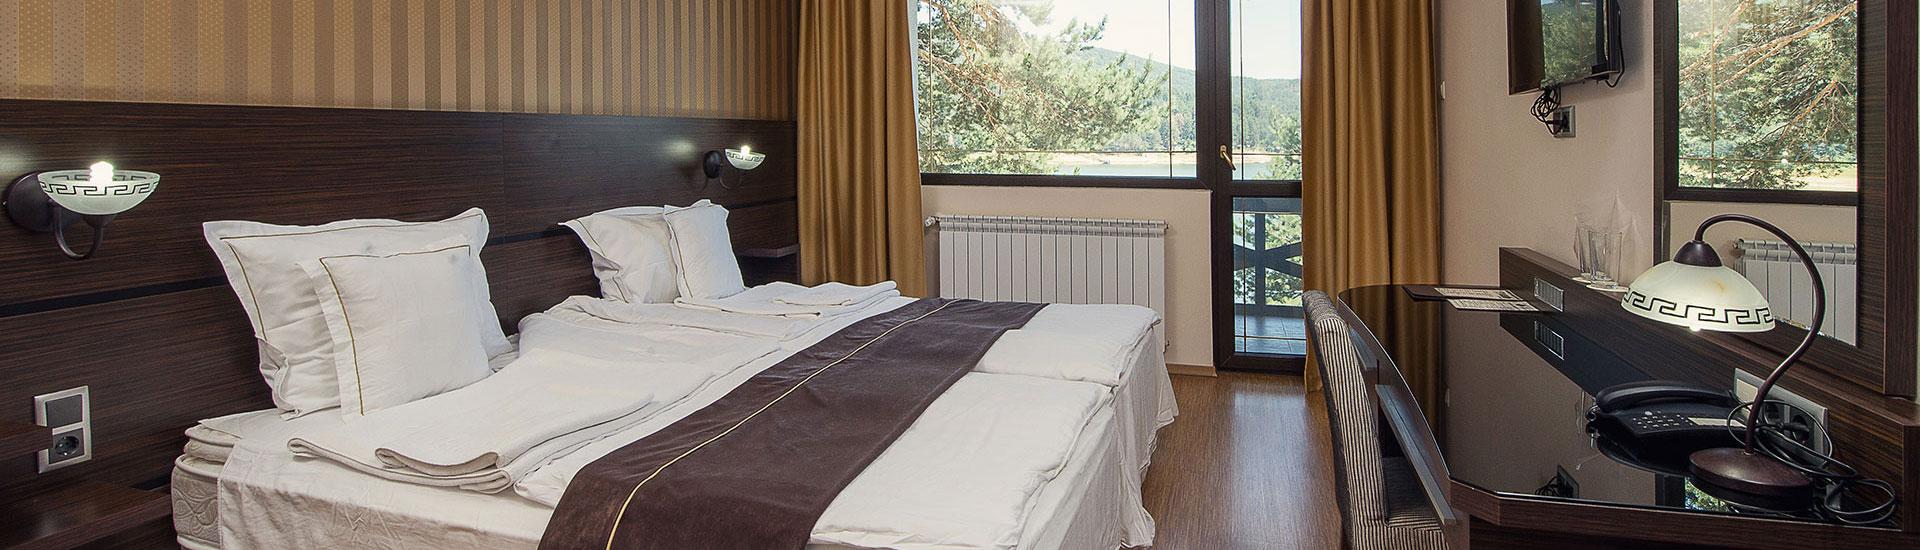 Grand FAMILY SPA HOTEL HEBAR - Rooms